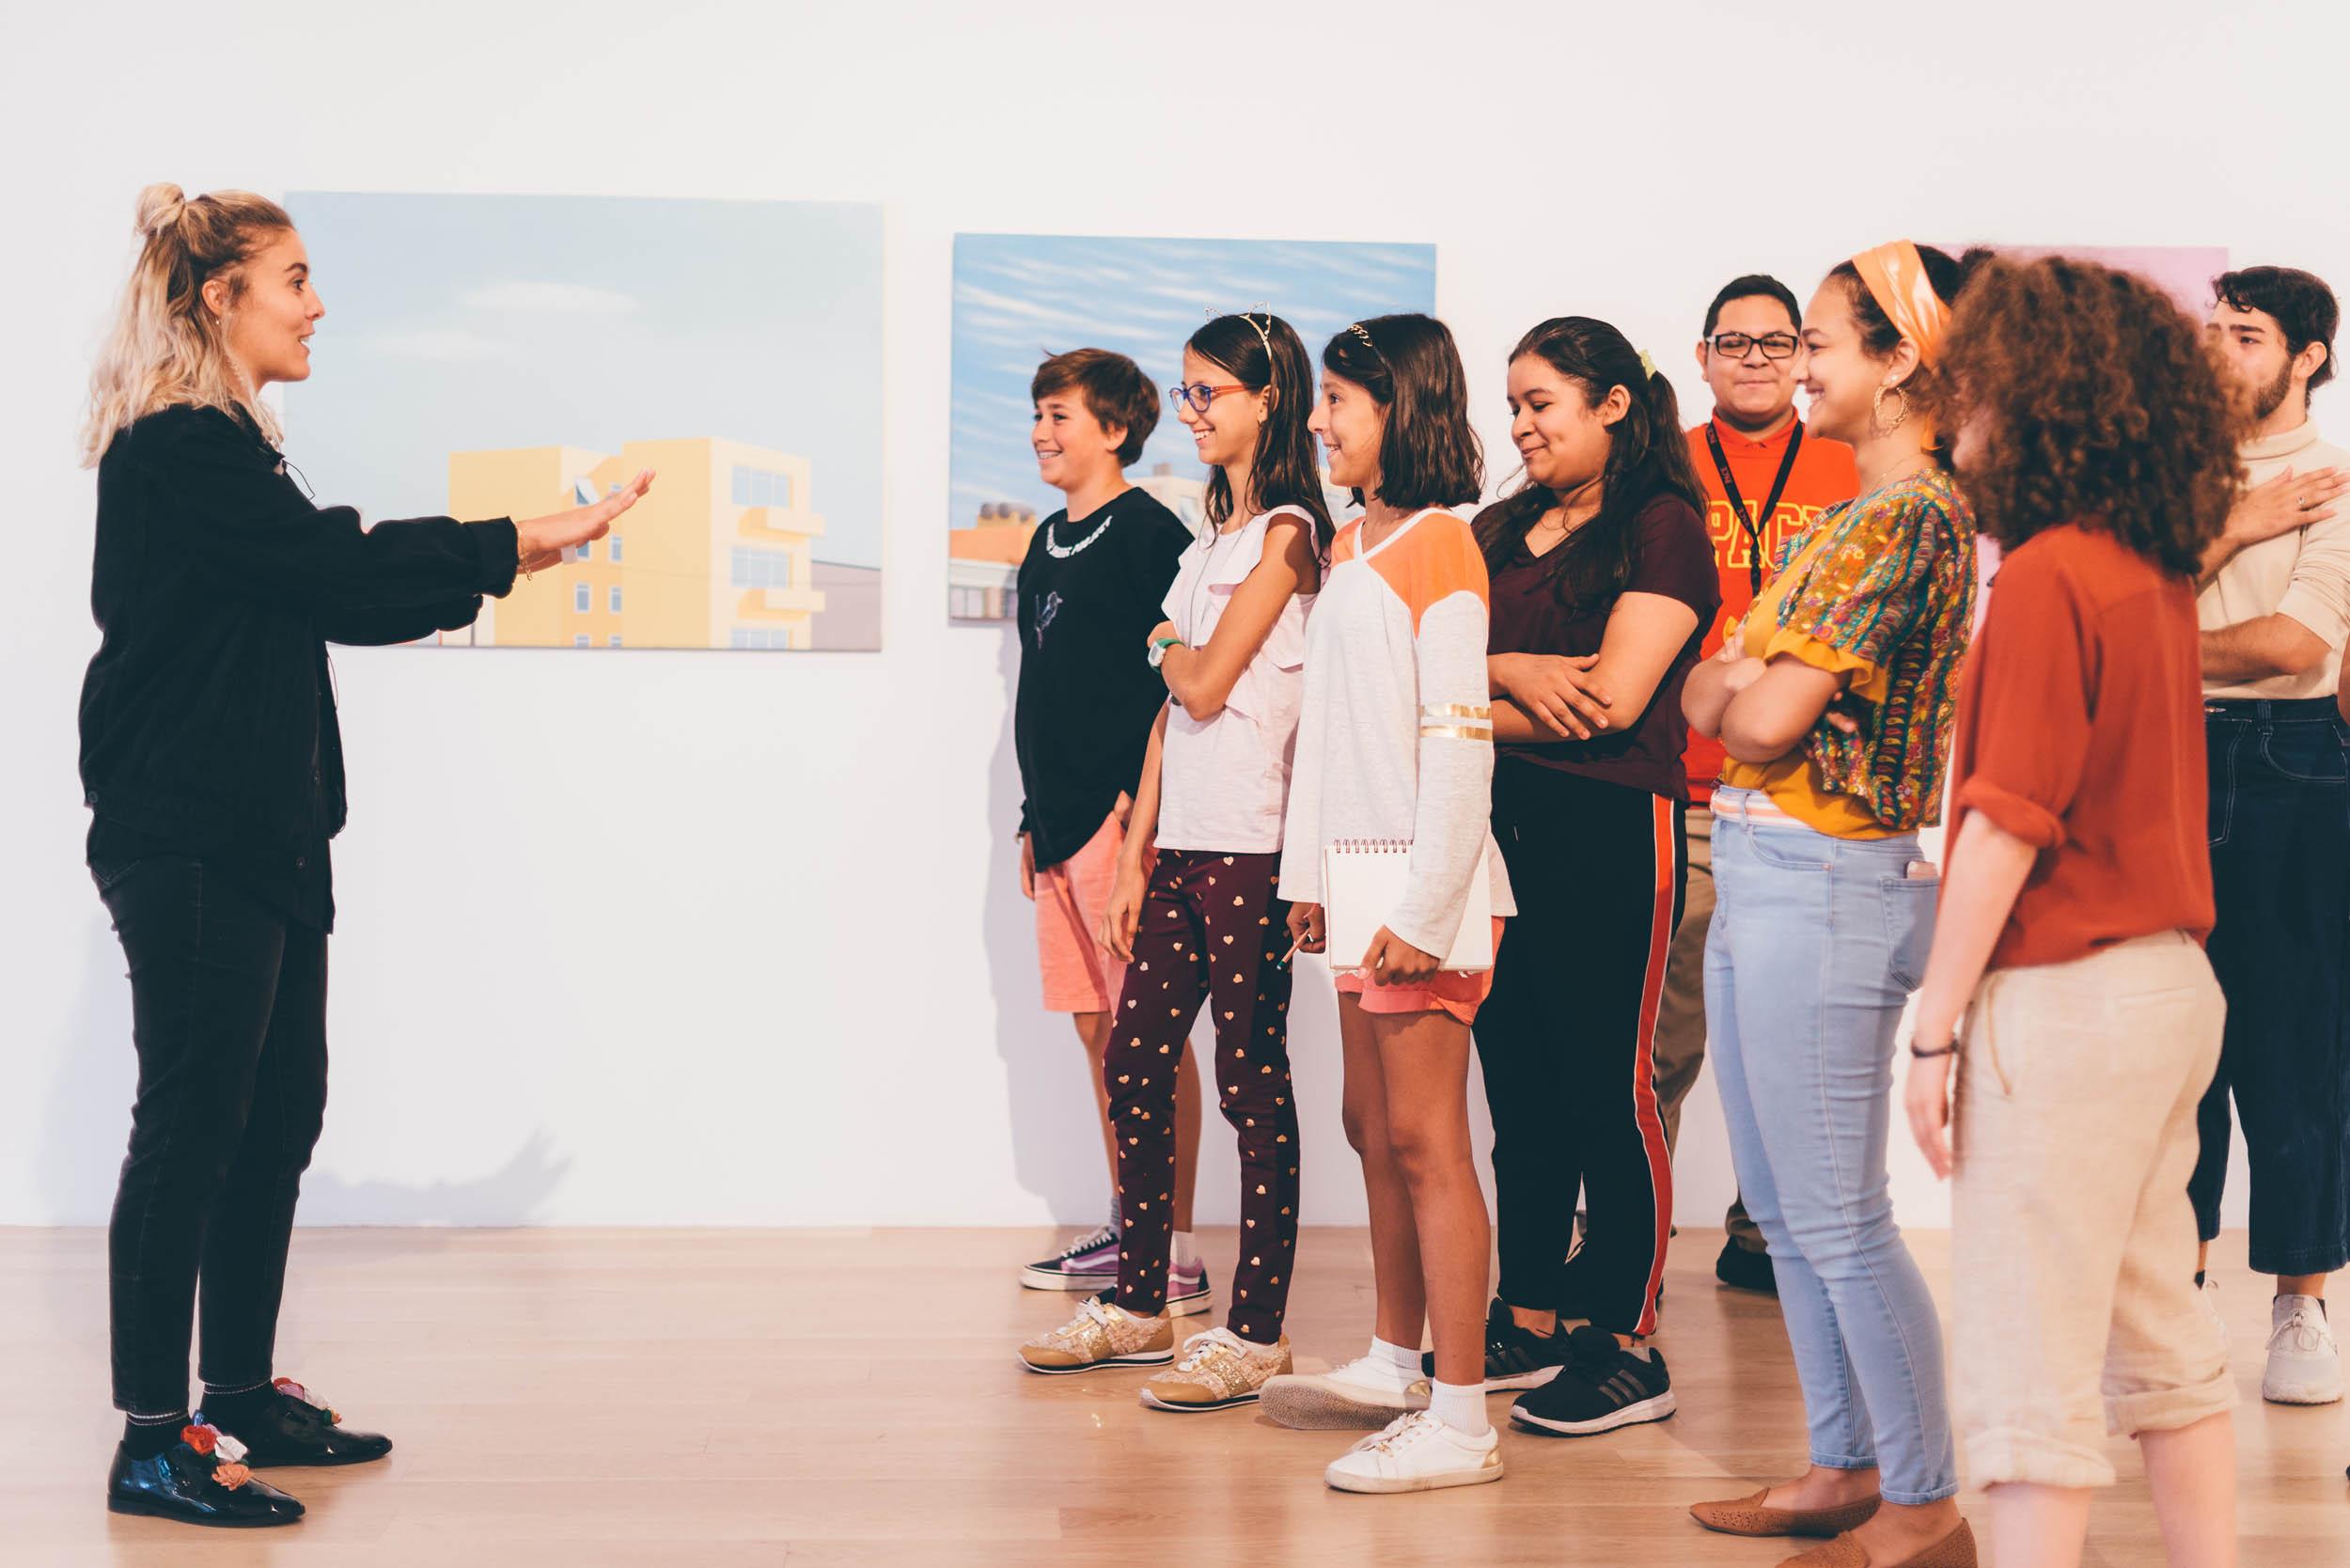 Education at ICA Miami. Photo: Javier Sanchez.